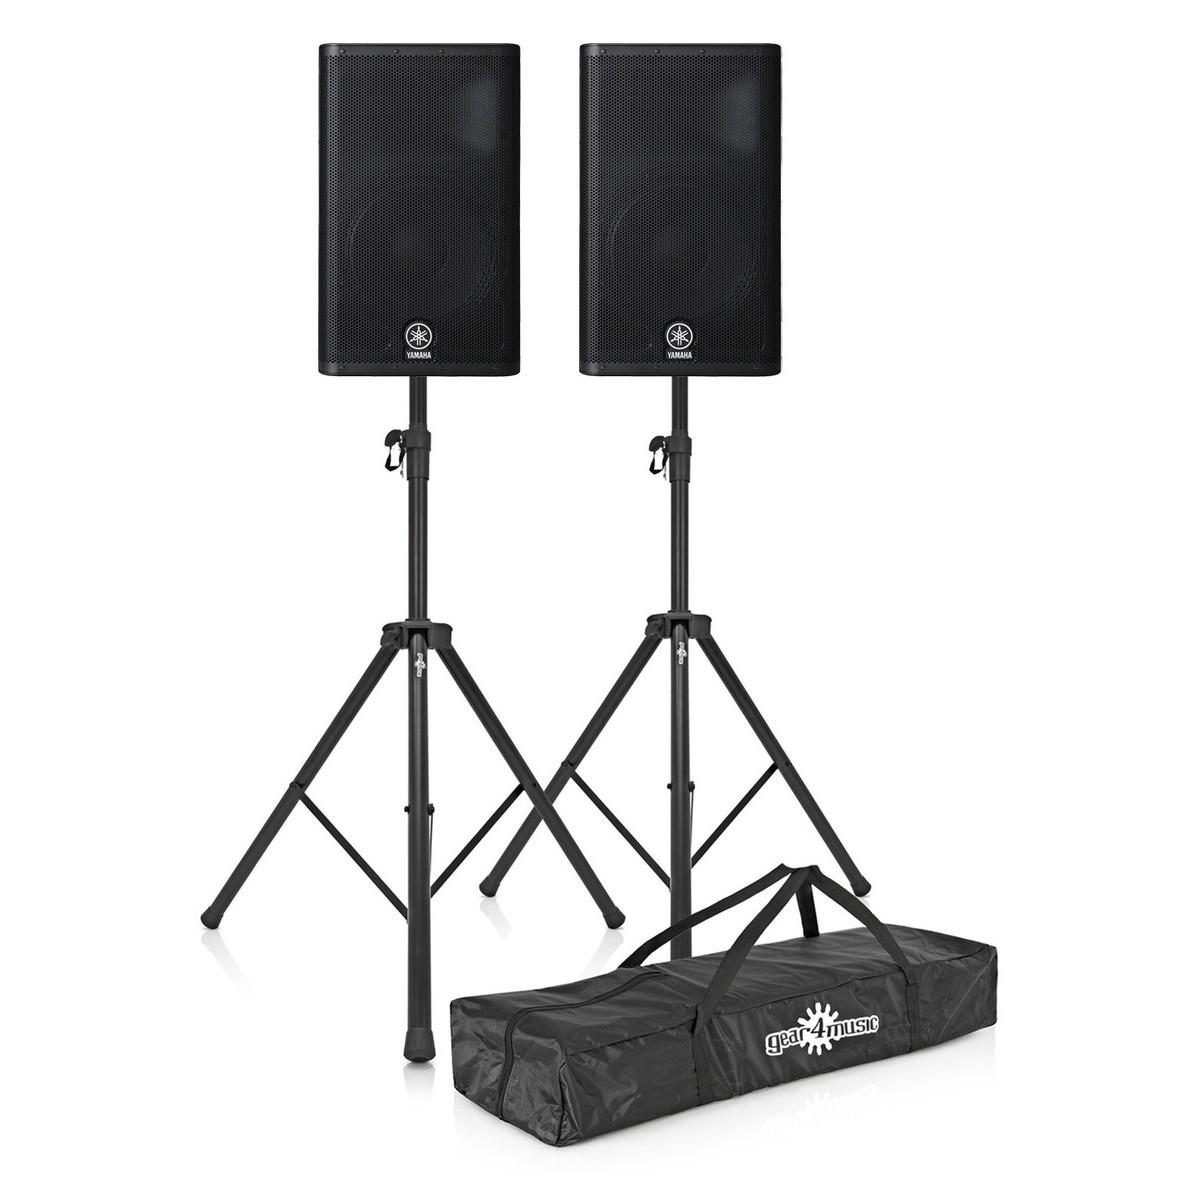 DISC Yamaha DSR112 Active PA Bundle With Speaker Stands